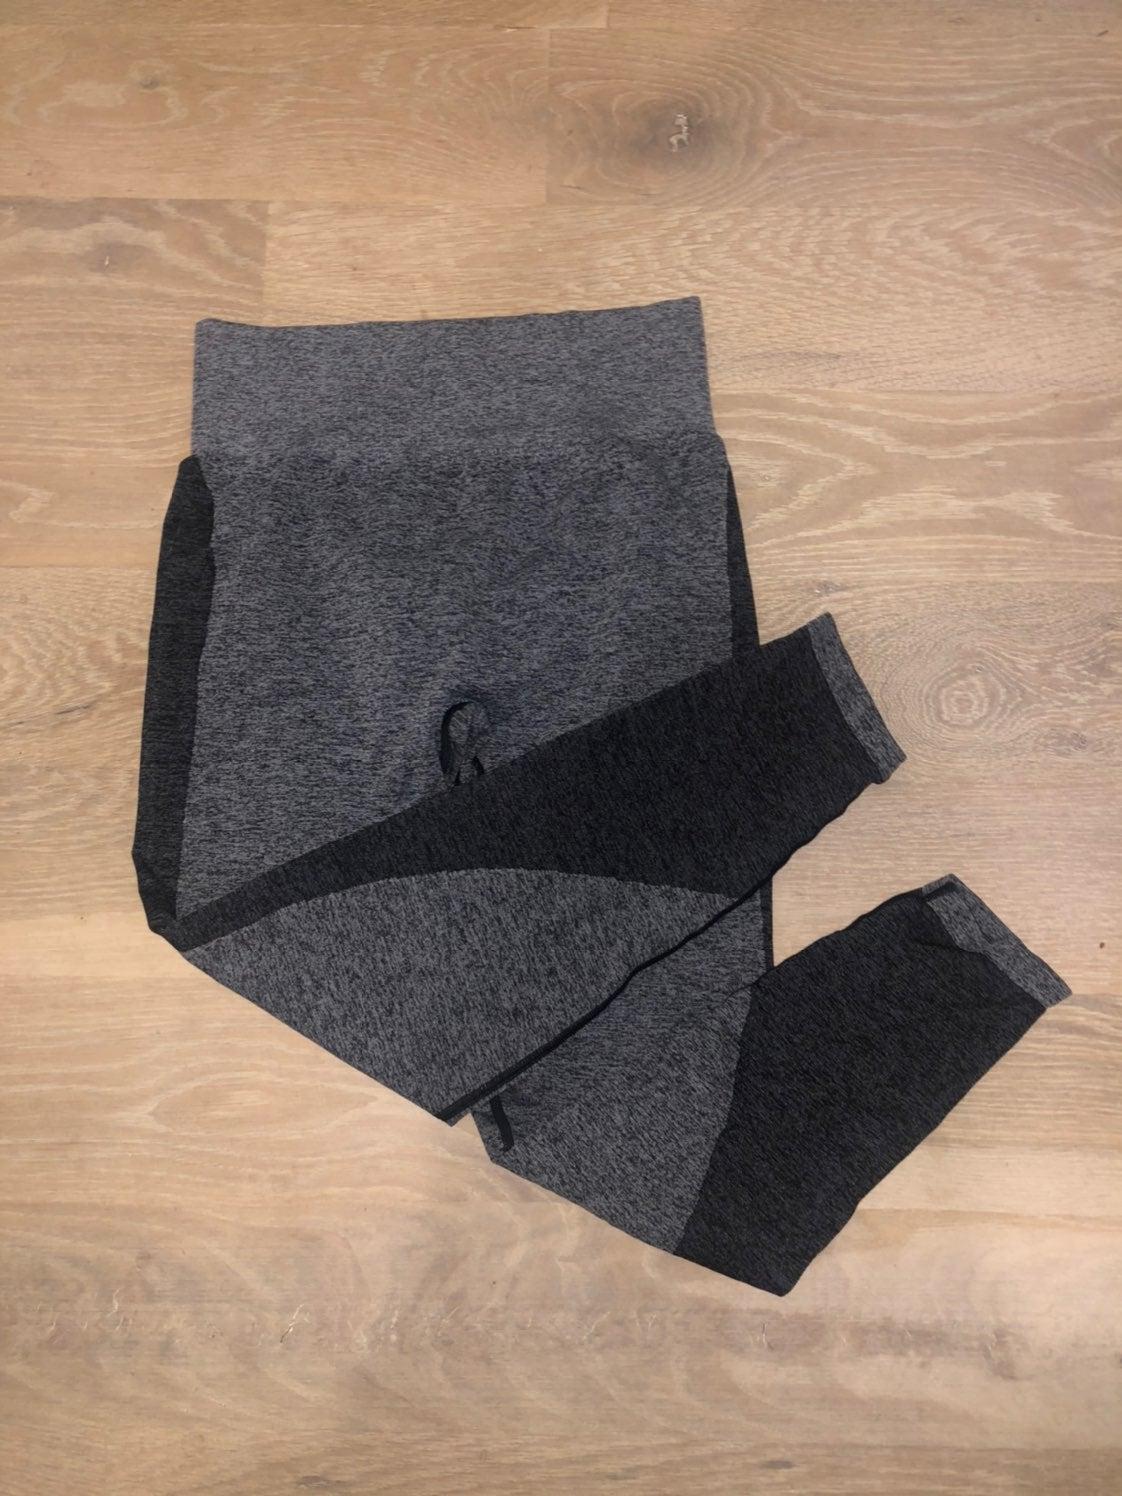 PINK leggings, size L